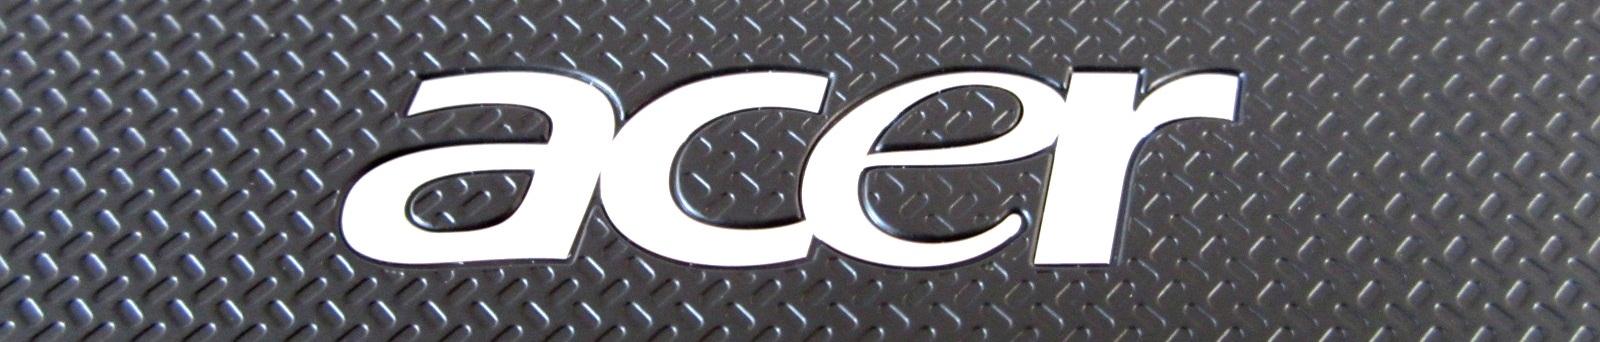 Acer Aspire 5750G 2354G50Mnkk